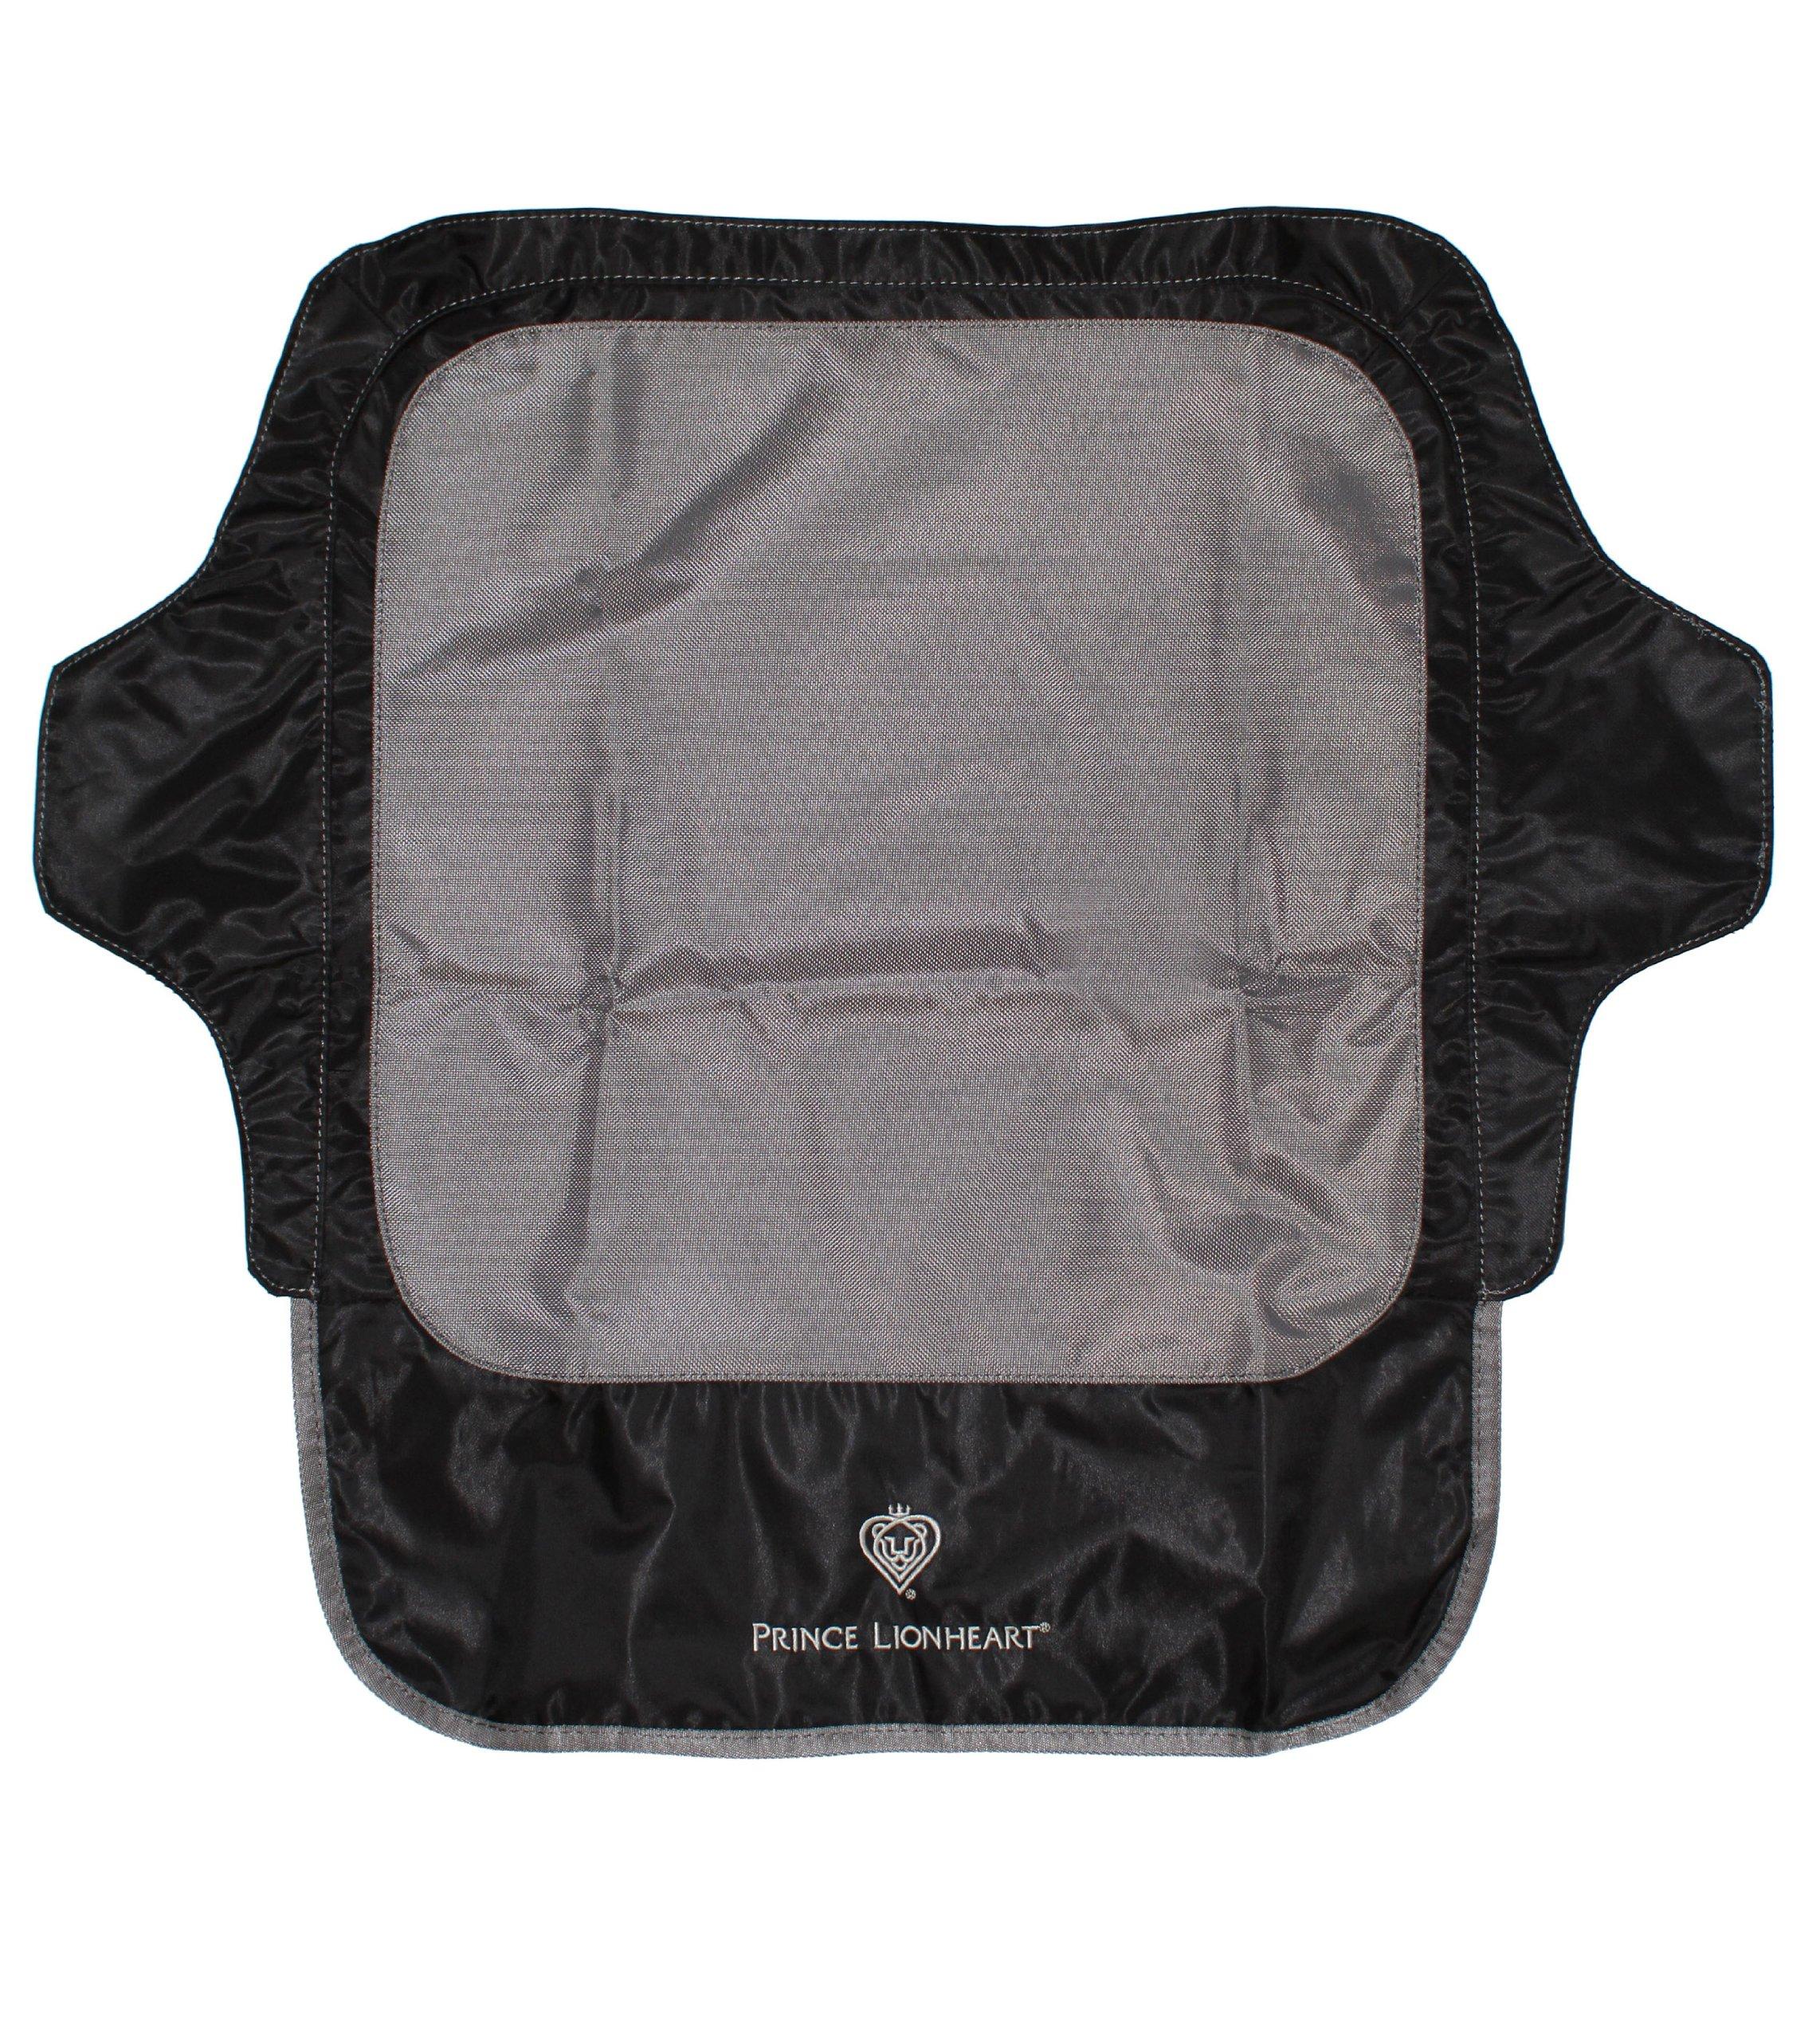 Amazon.com : Prince Lionheart Soft Booster Seat, Charcoal